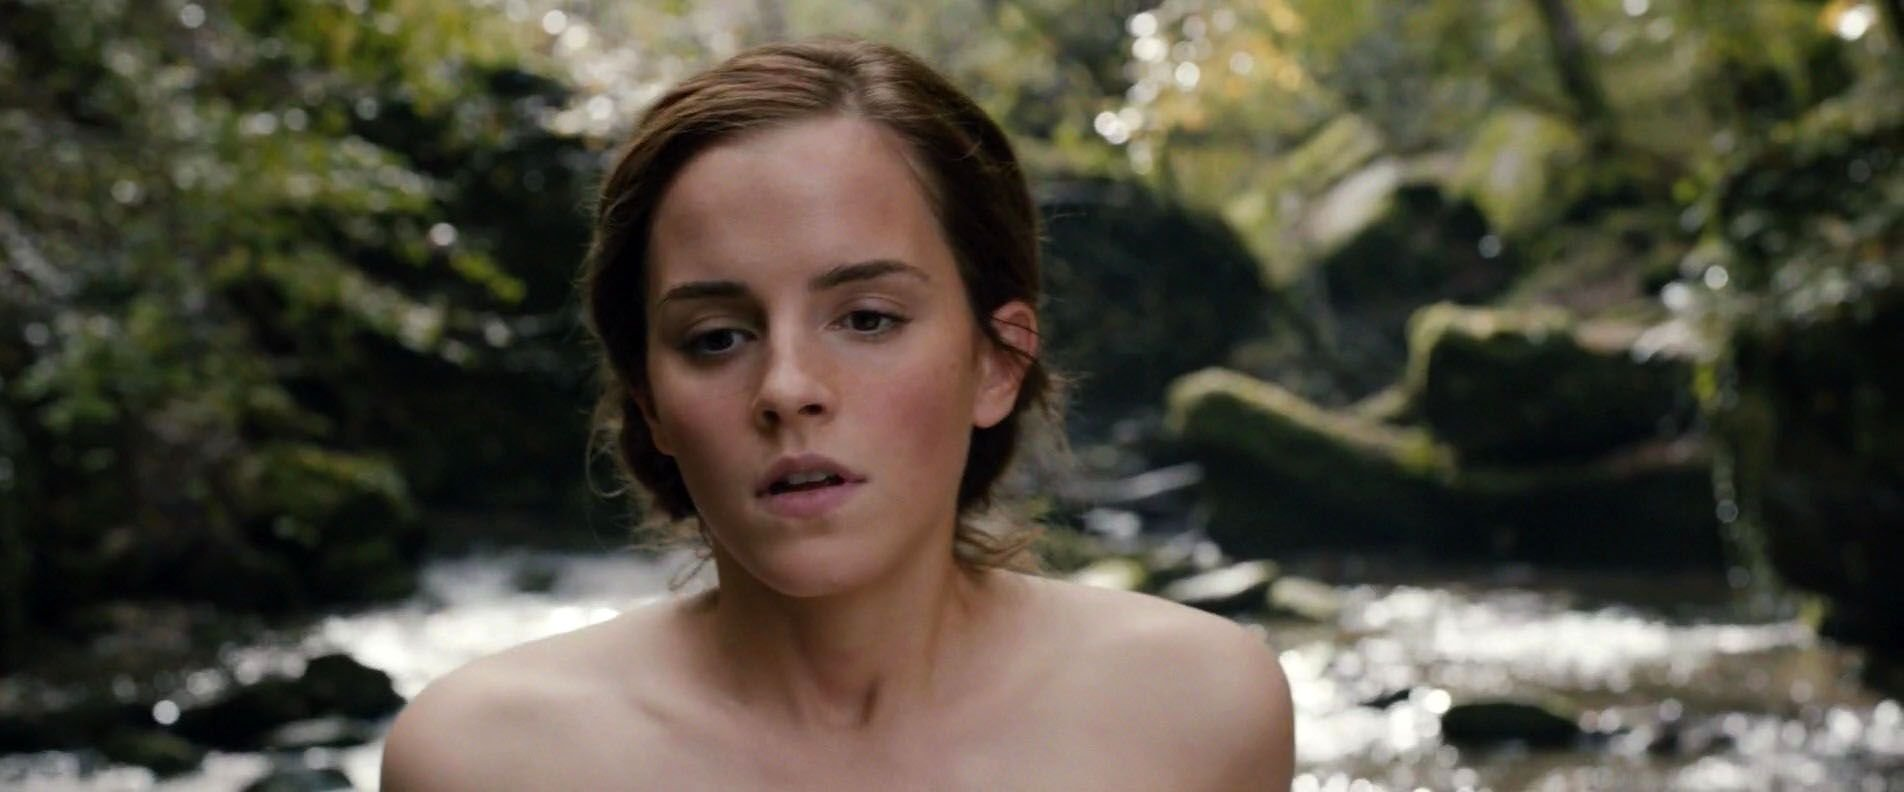 Jennifer love hewitt scene